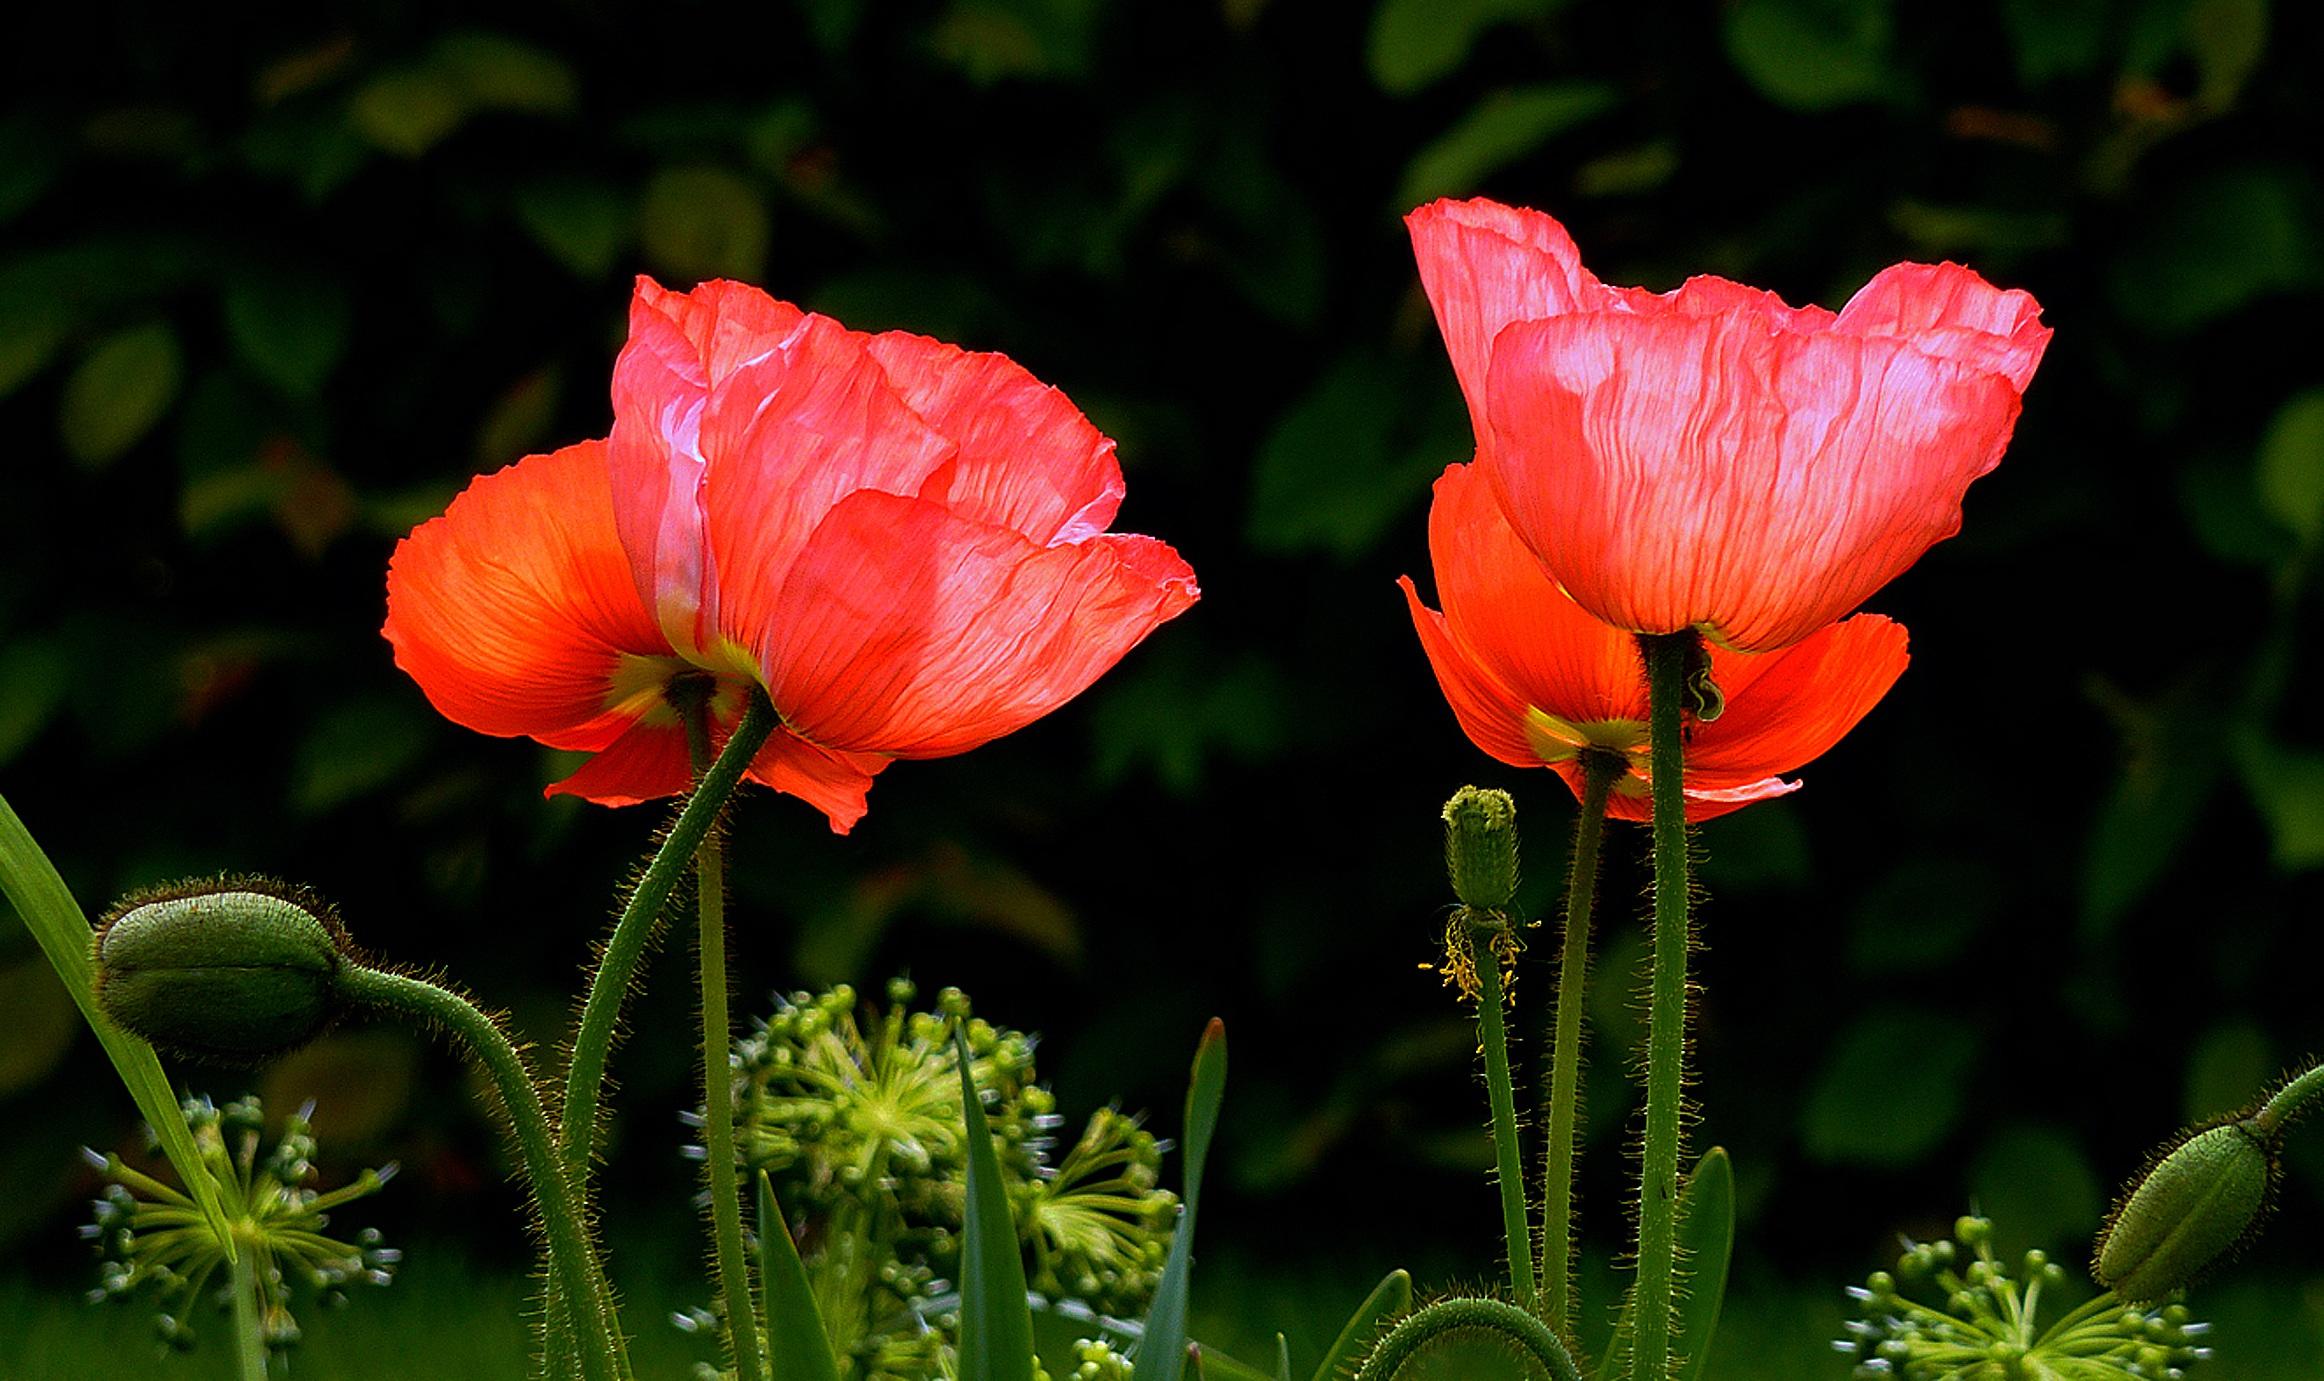 free images blossom petal bloom botany flora wildflower